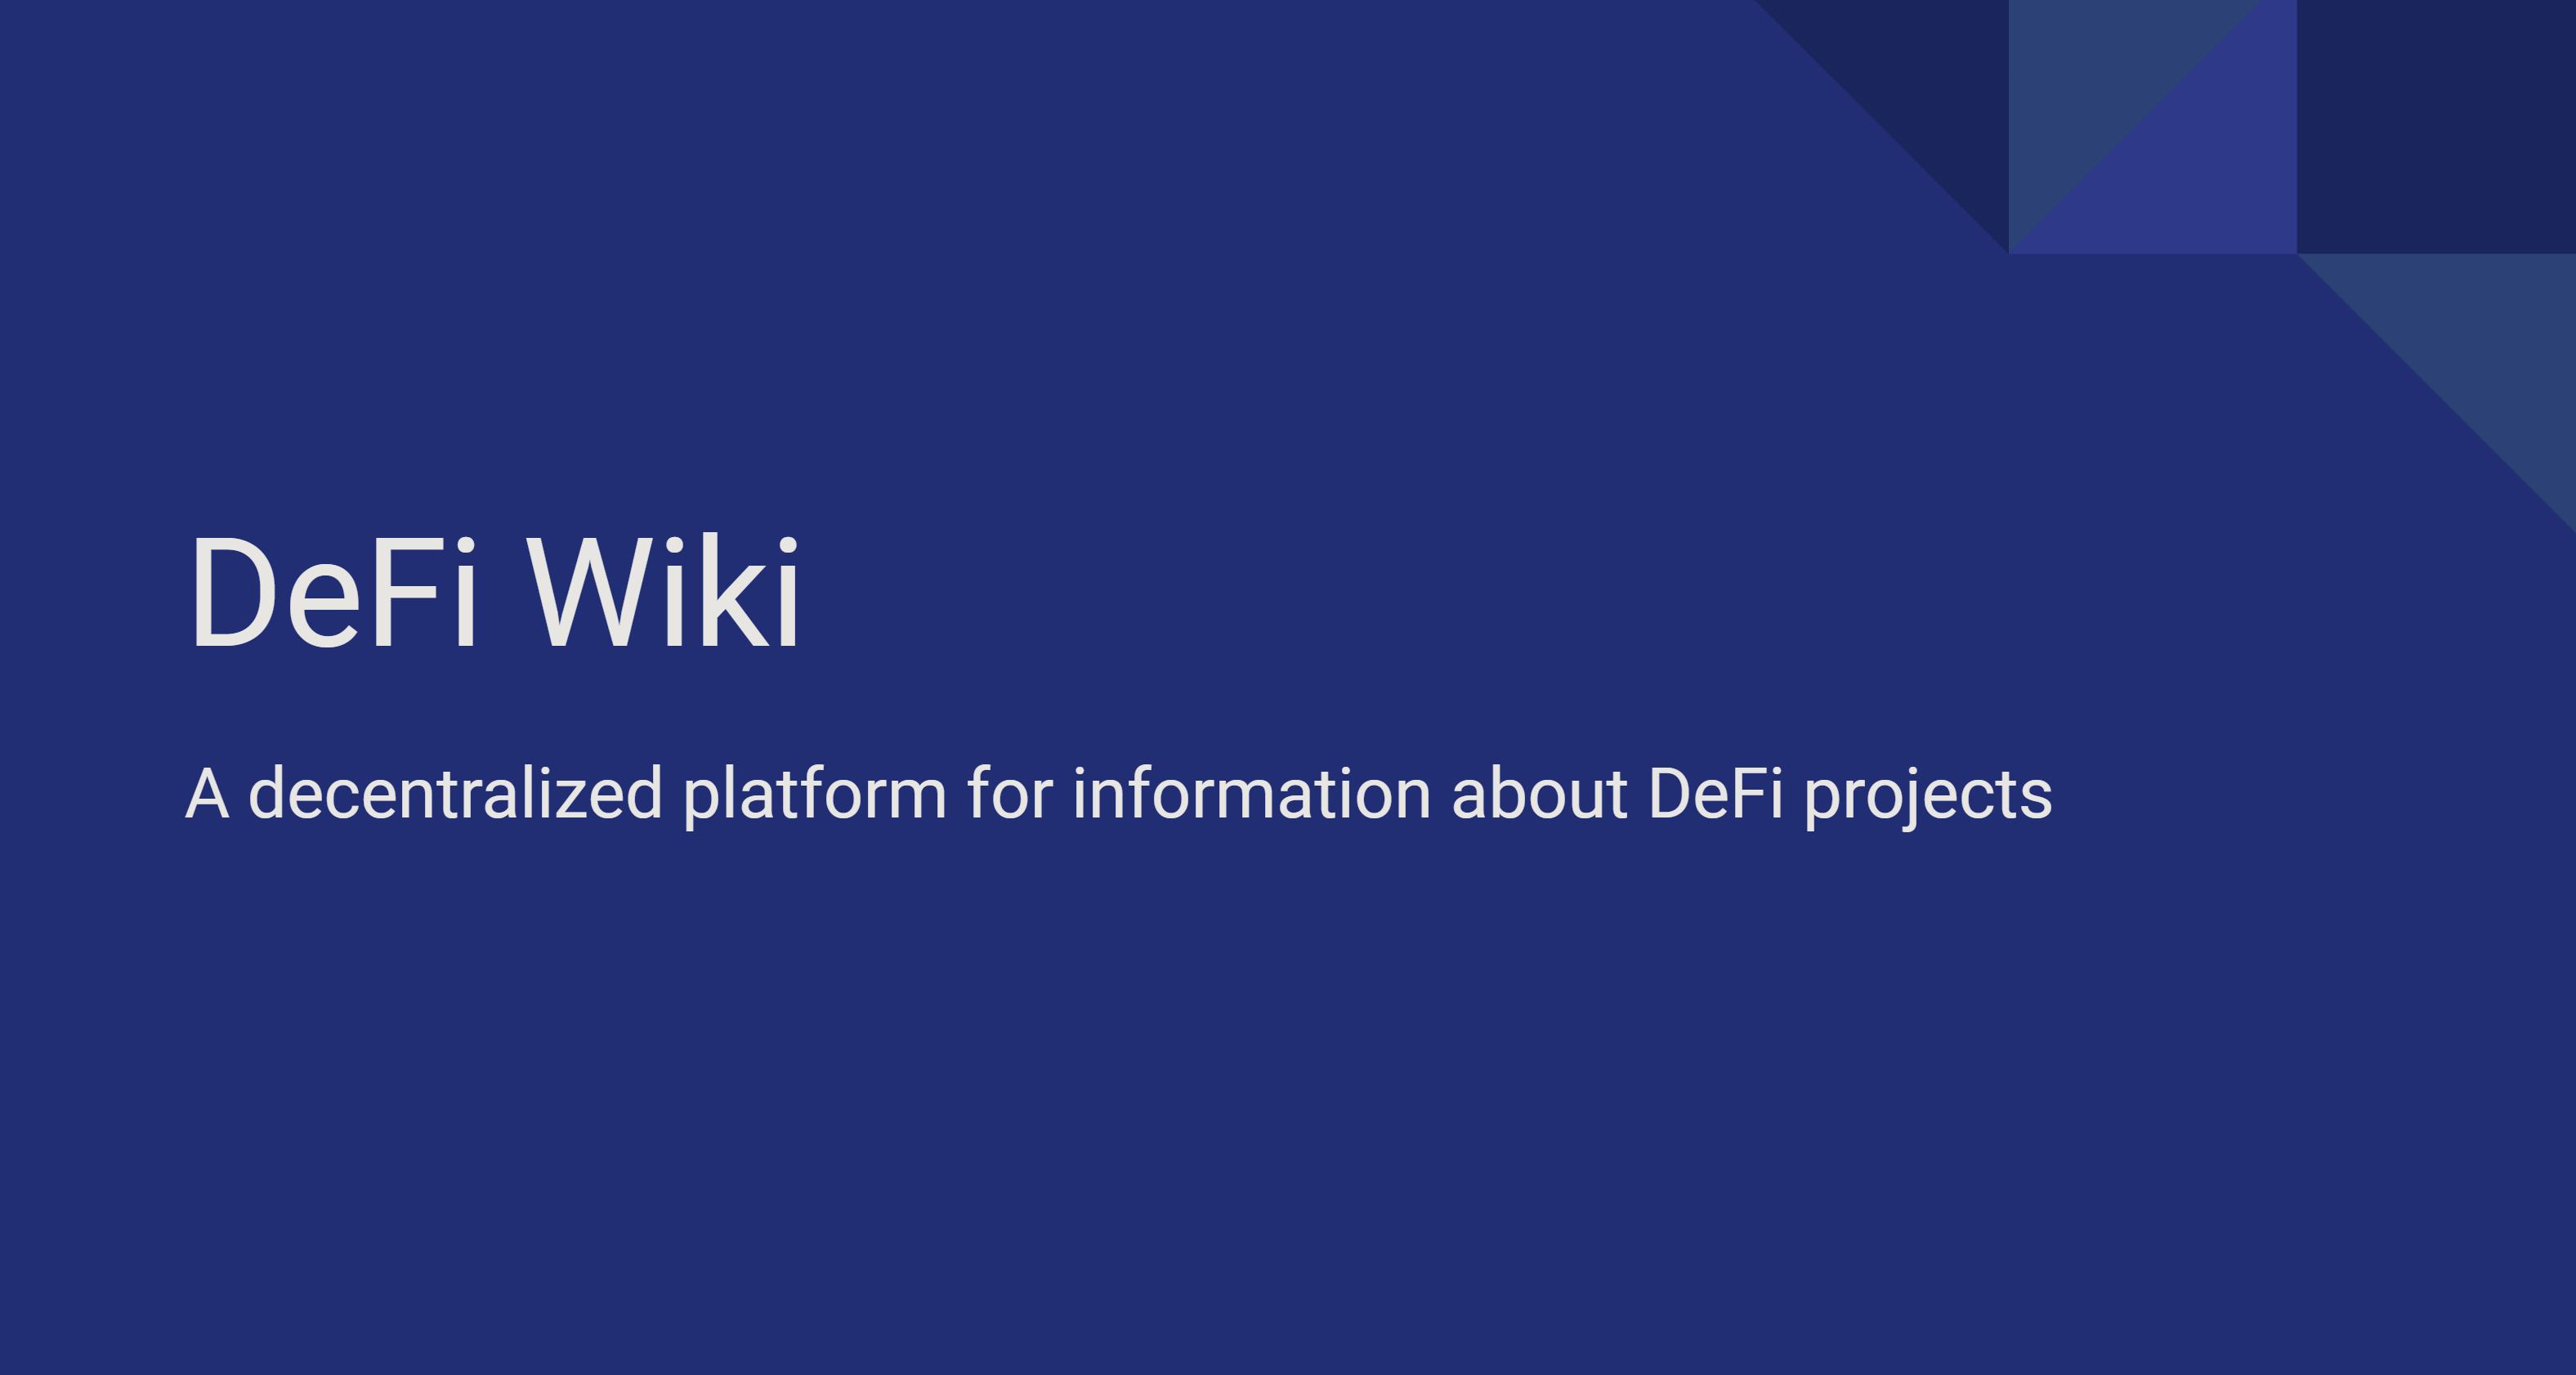 DeFiWiki showcase